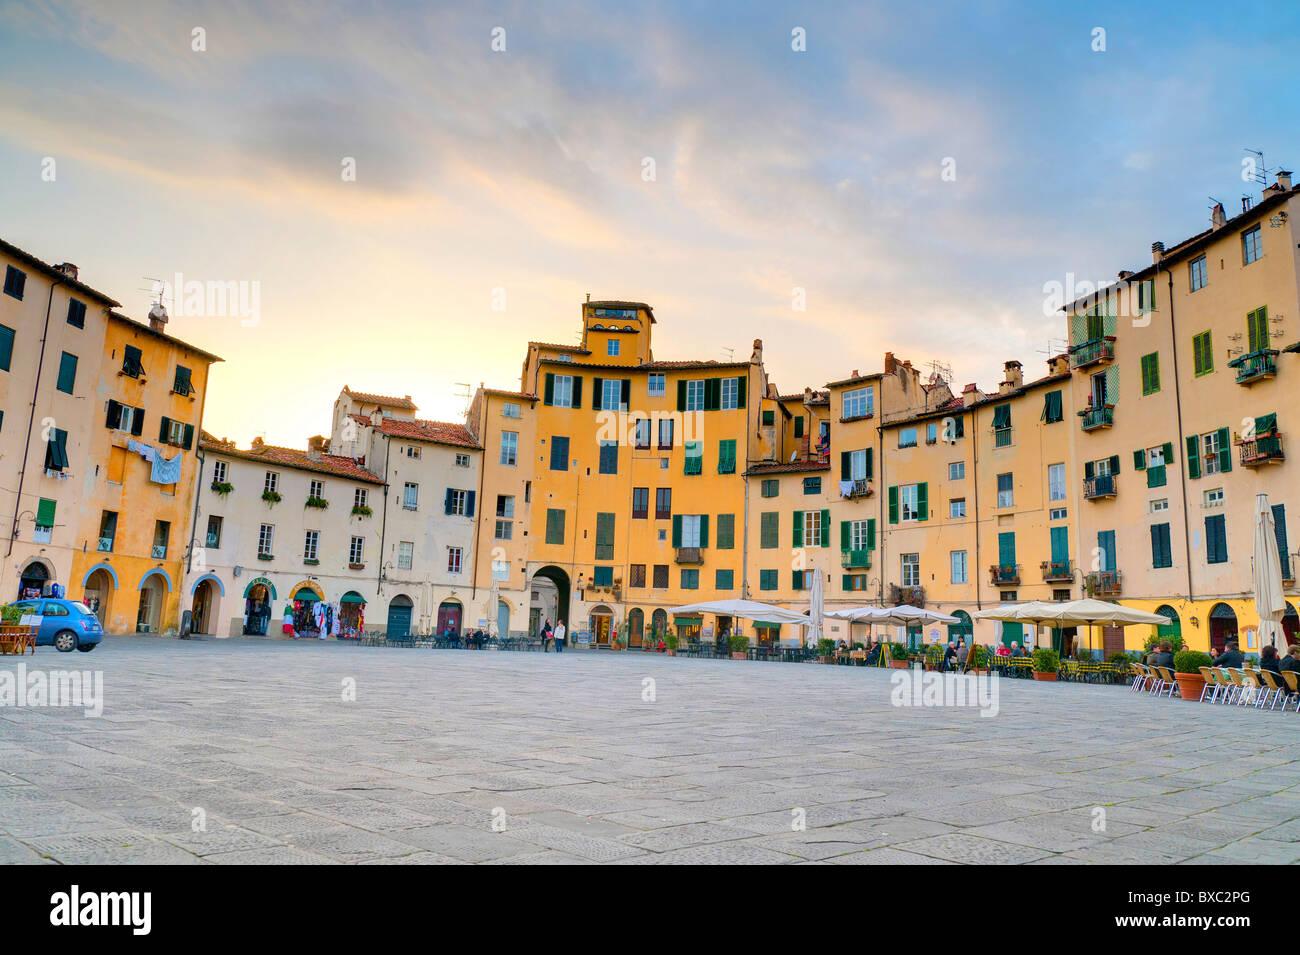 Piazza Anfiteatro Lucca Italy - Stock Image